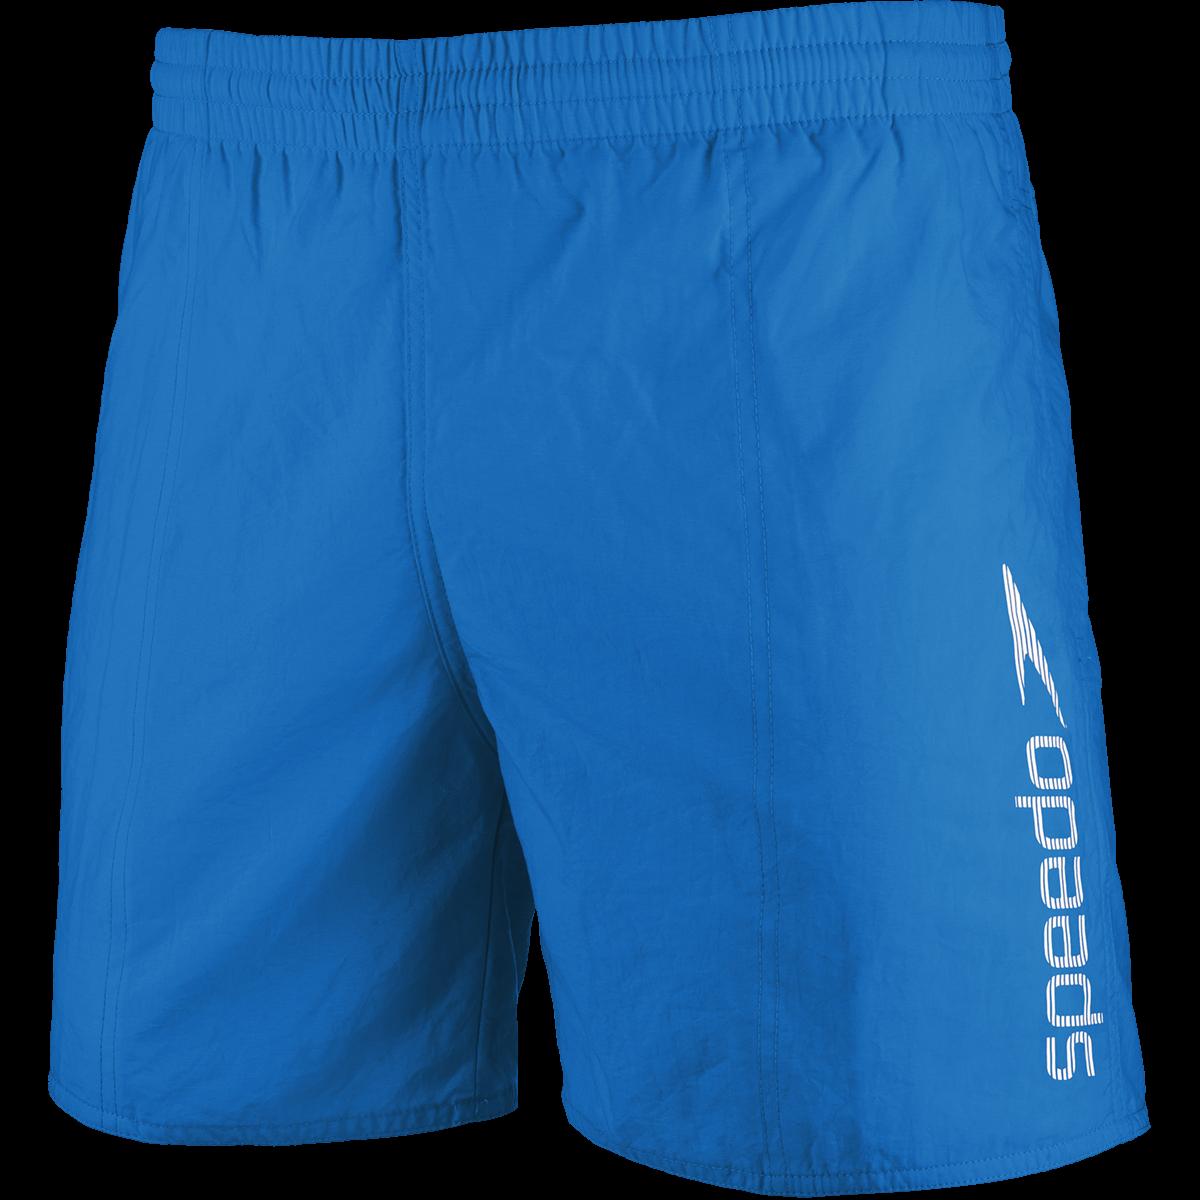 Speedo watershorts scope blau